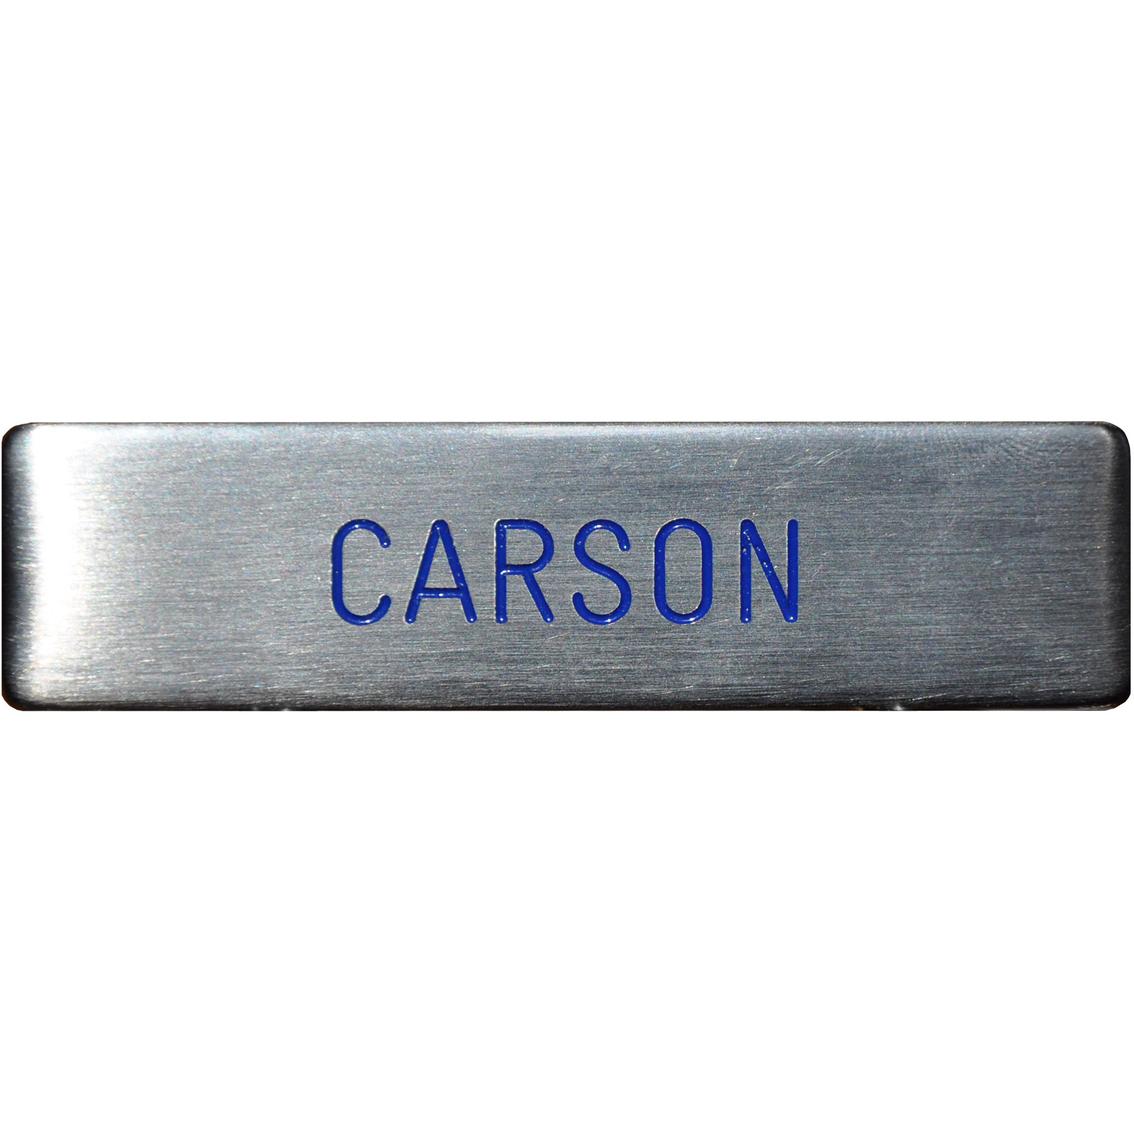 Air Force Silver Metal Engraved Nametag Name Tags